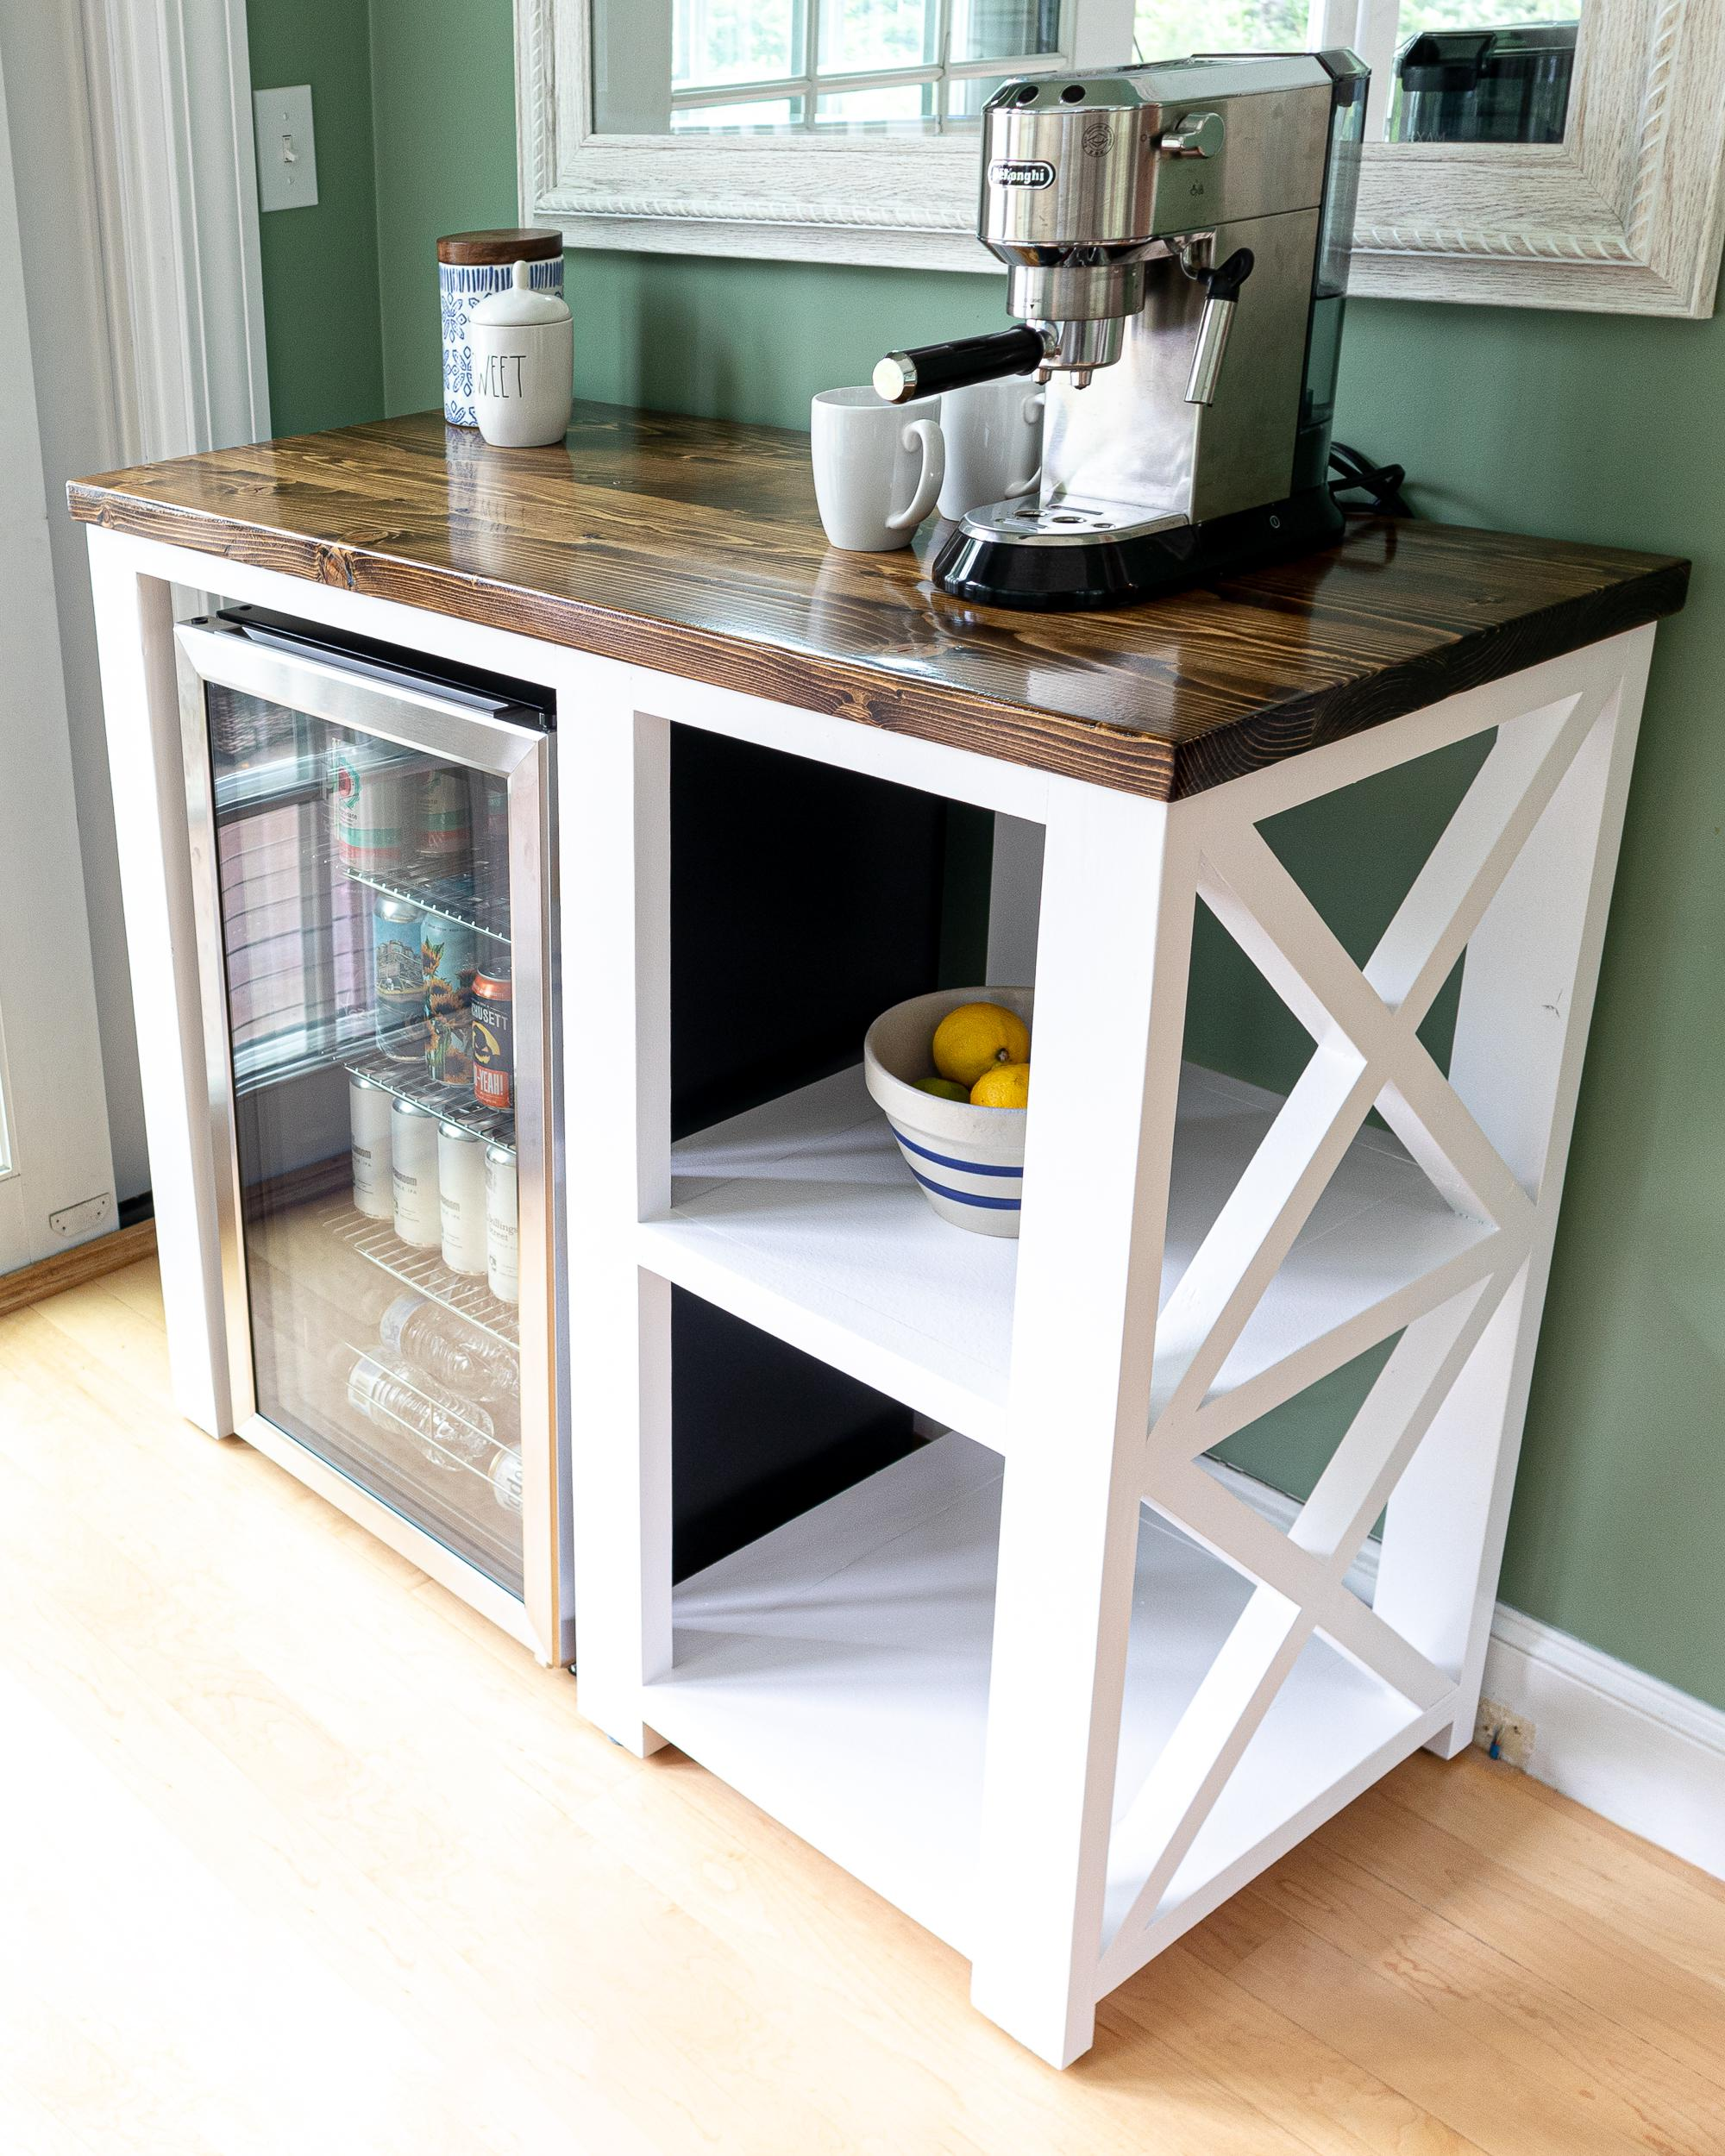 this coffee bar mini fridge table i